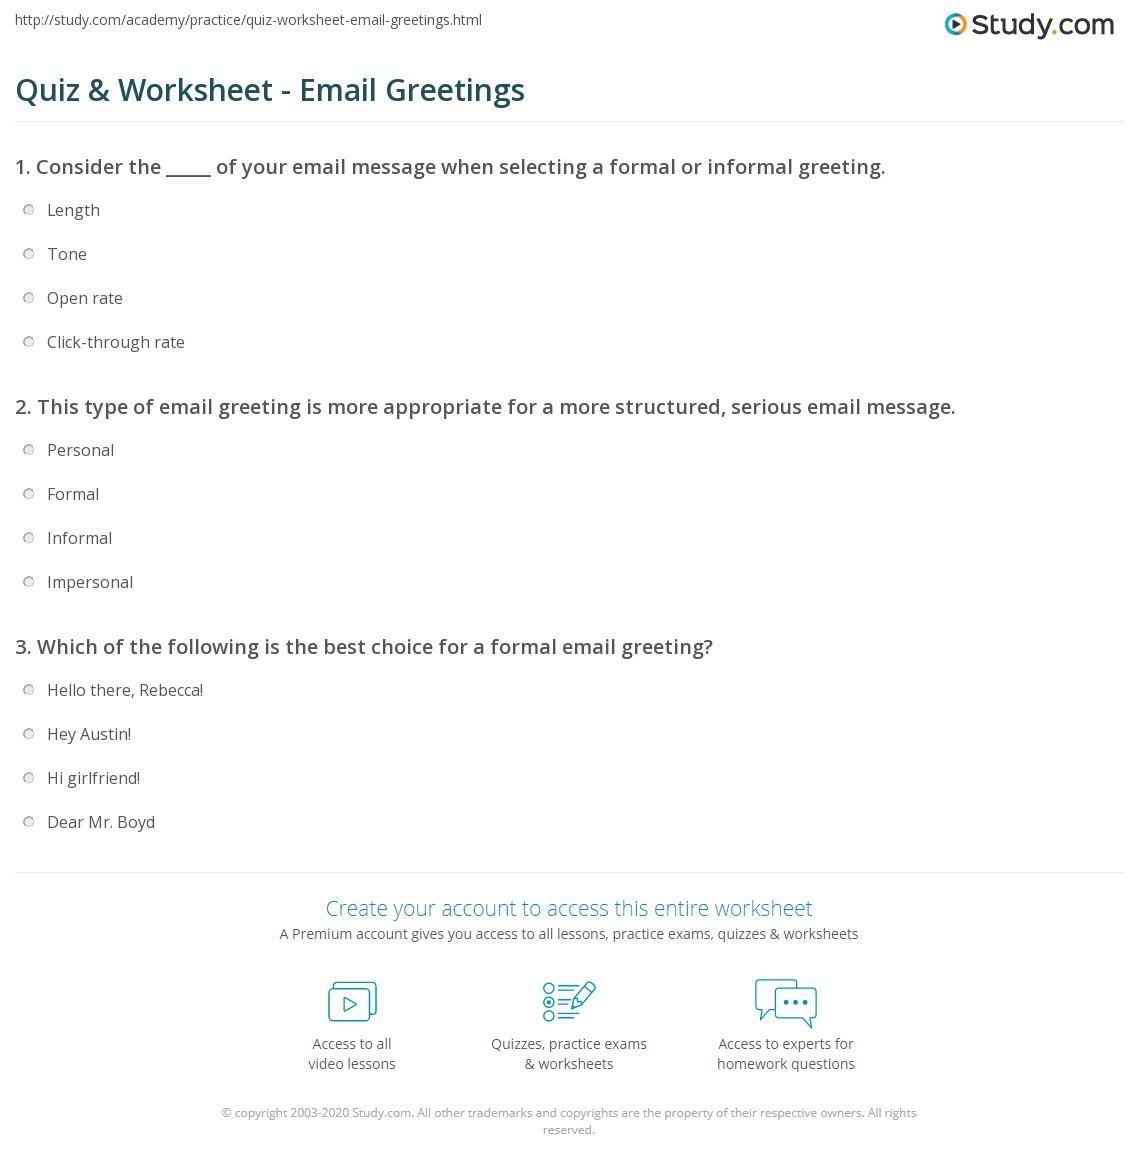 Quiz & Worksheet - Email Greetings | Study.com